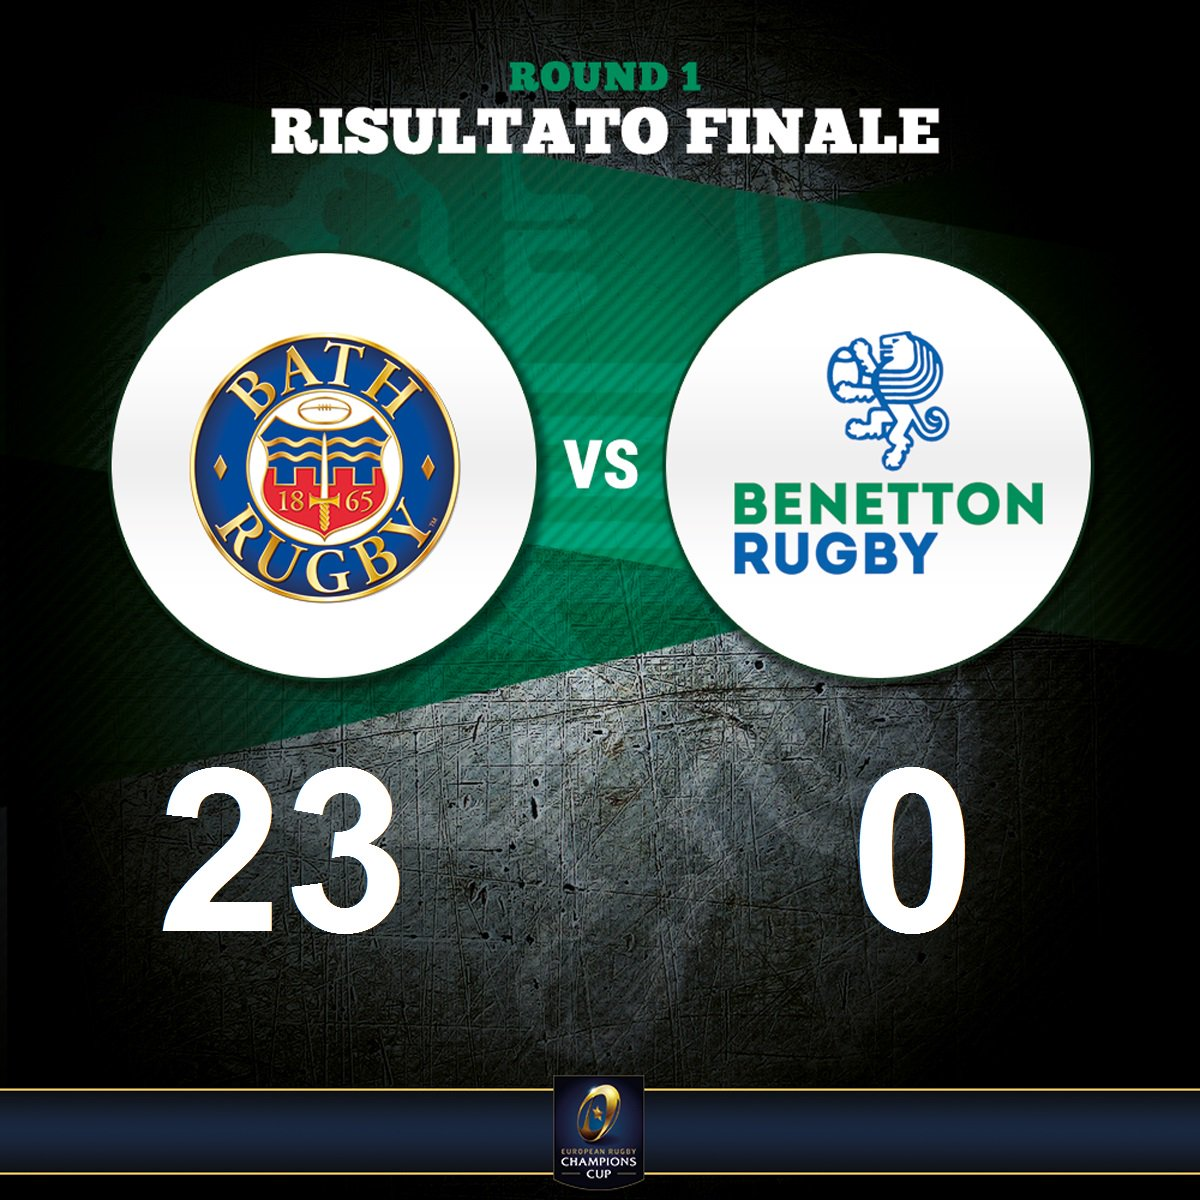 BenettonRugby